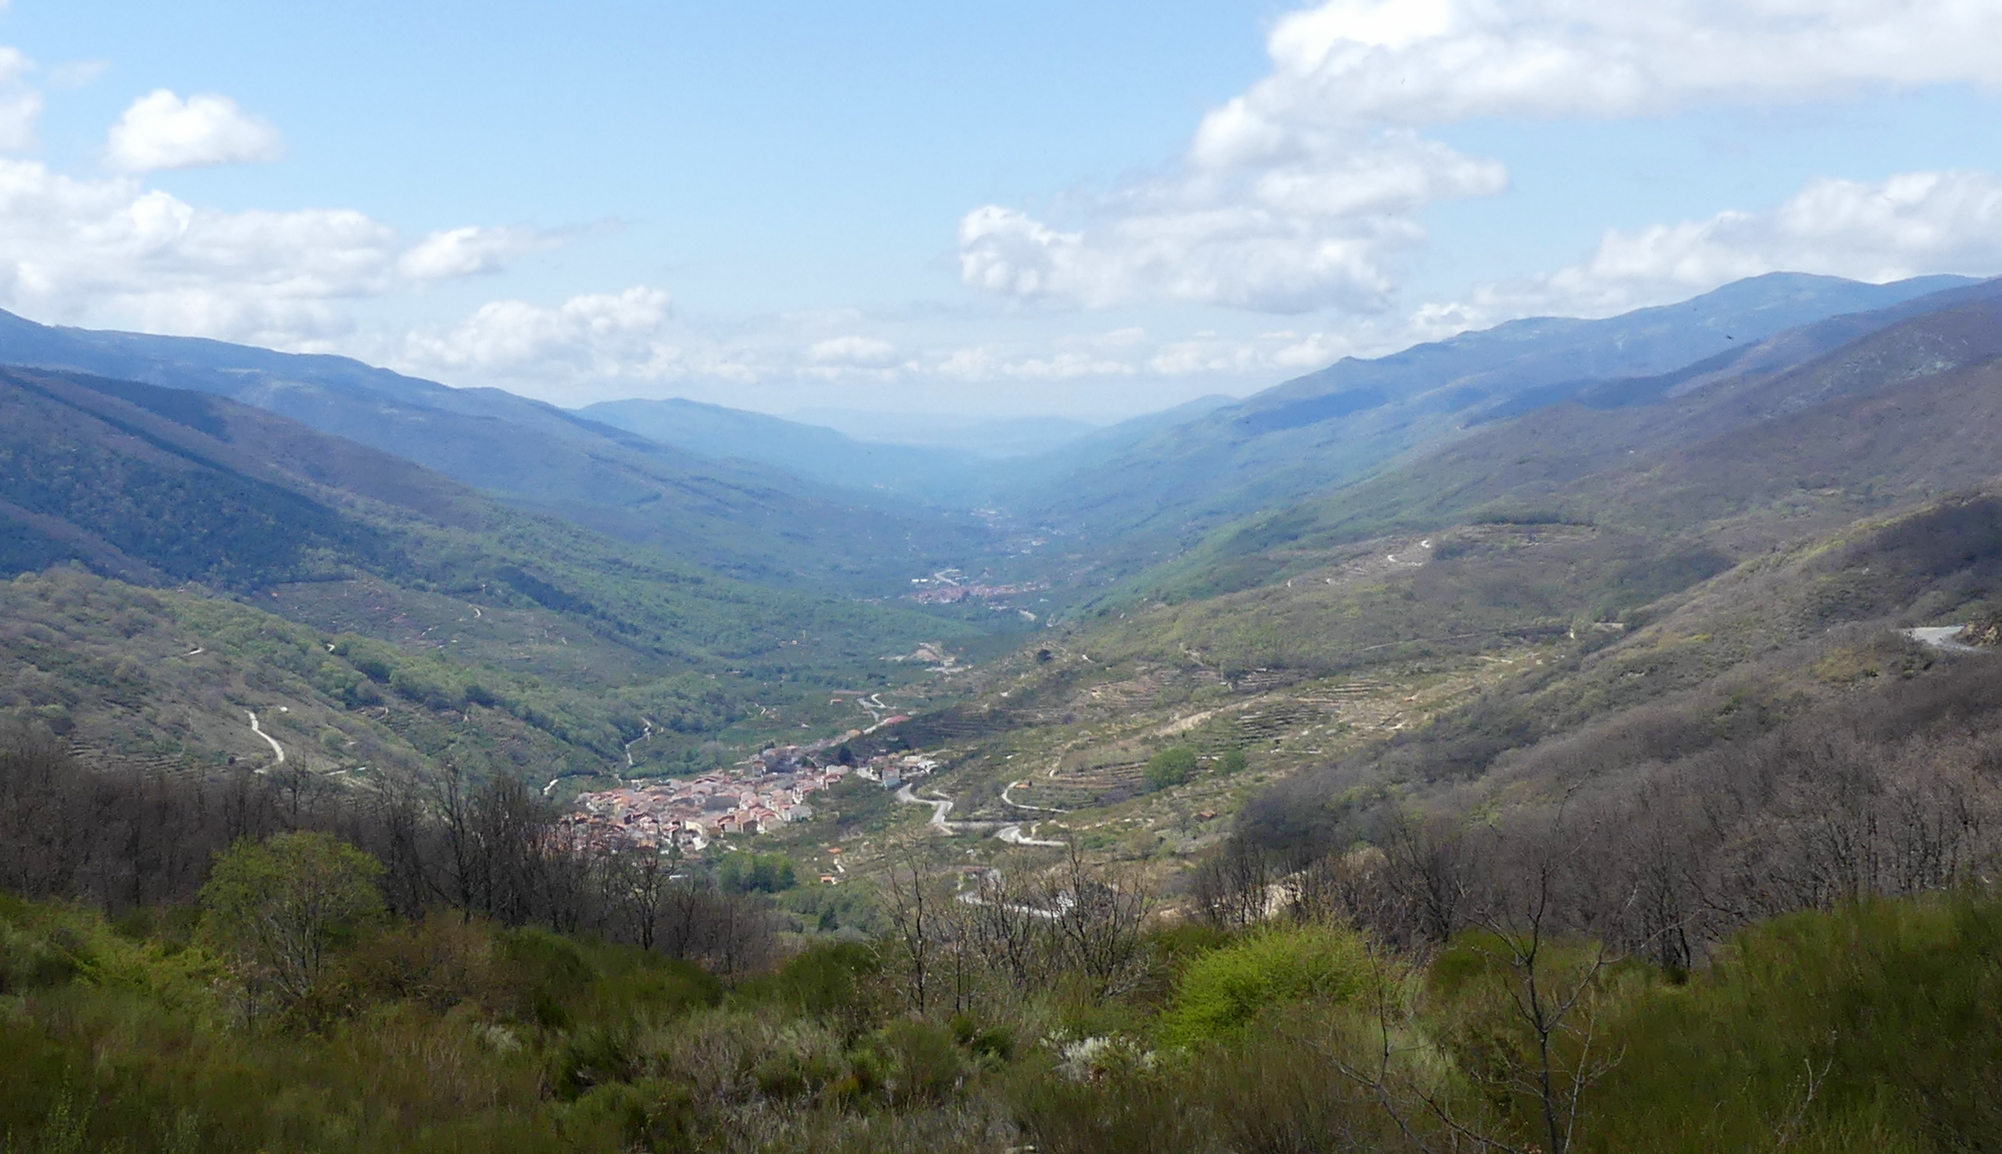 Valle del Jerte, 14 Apr 19